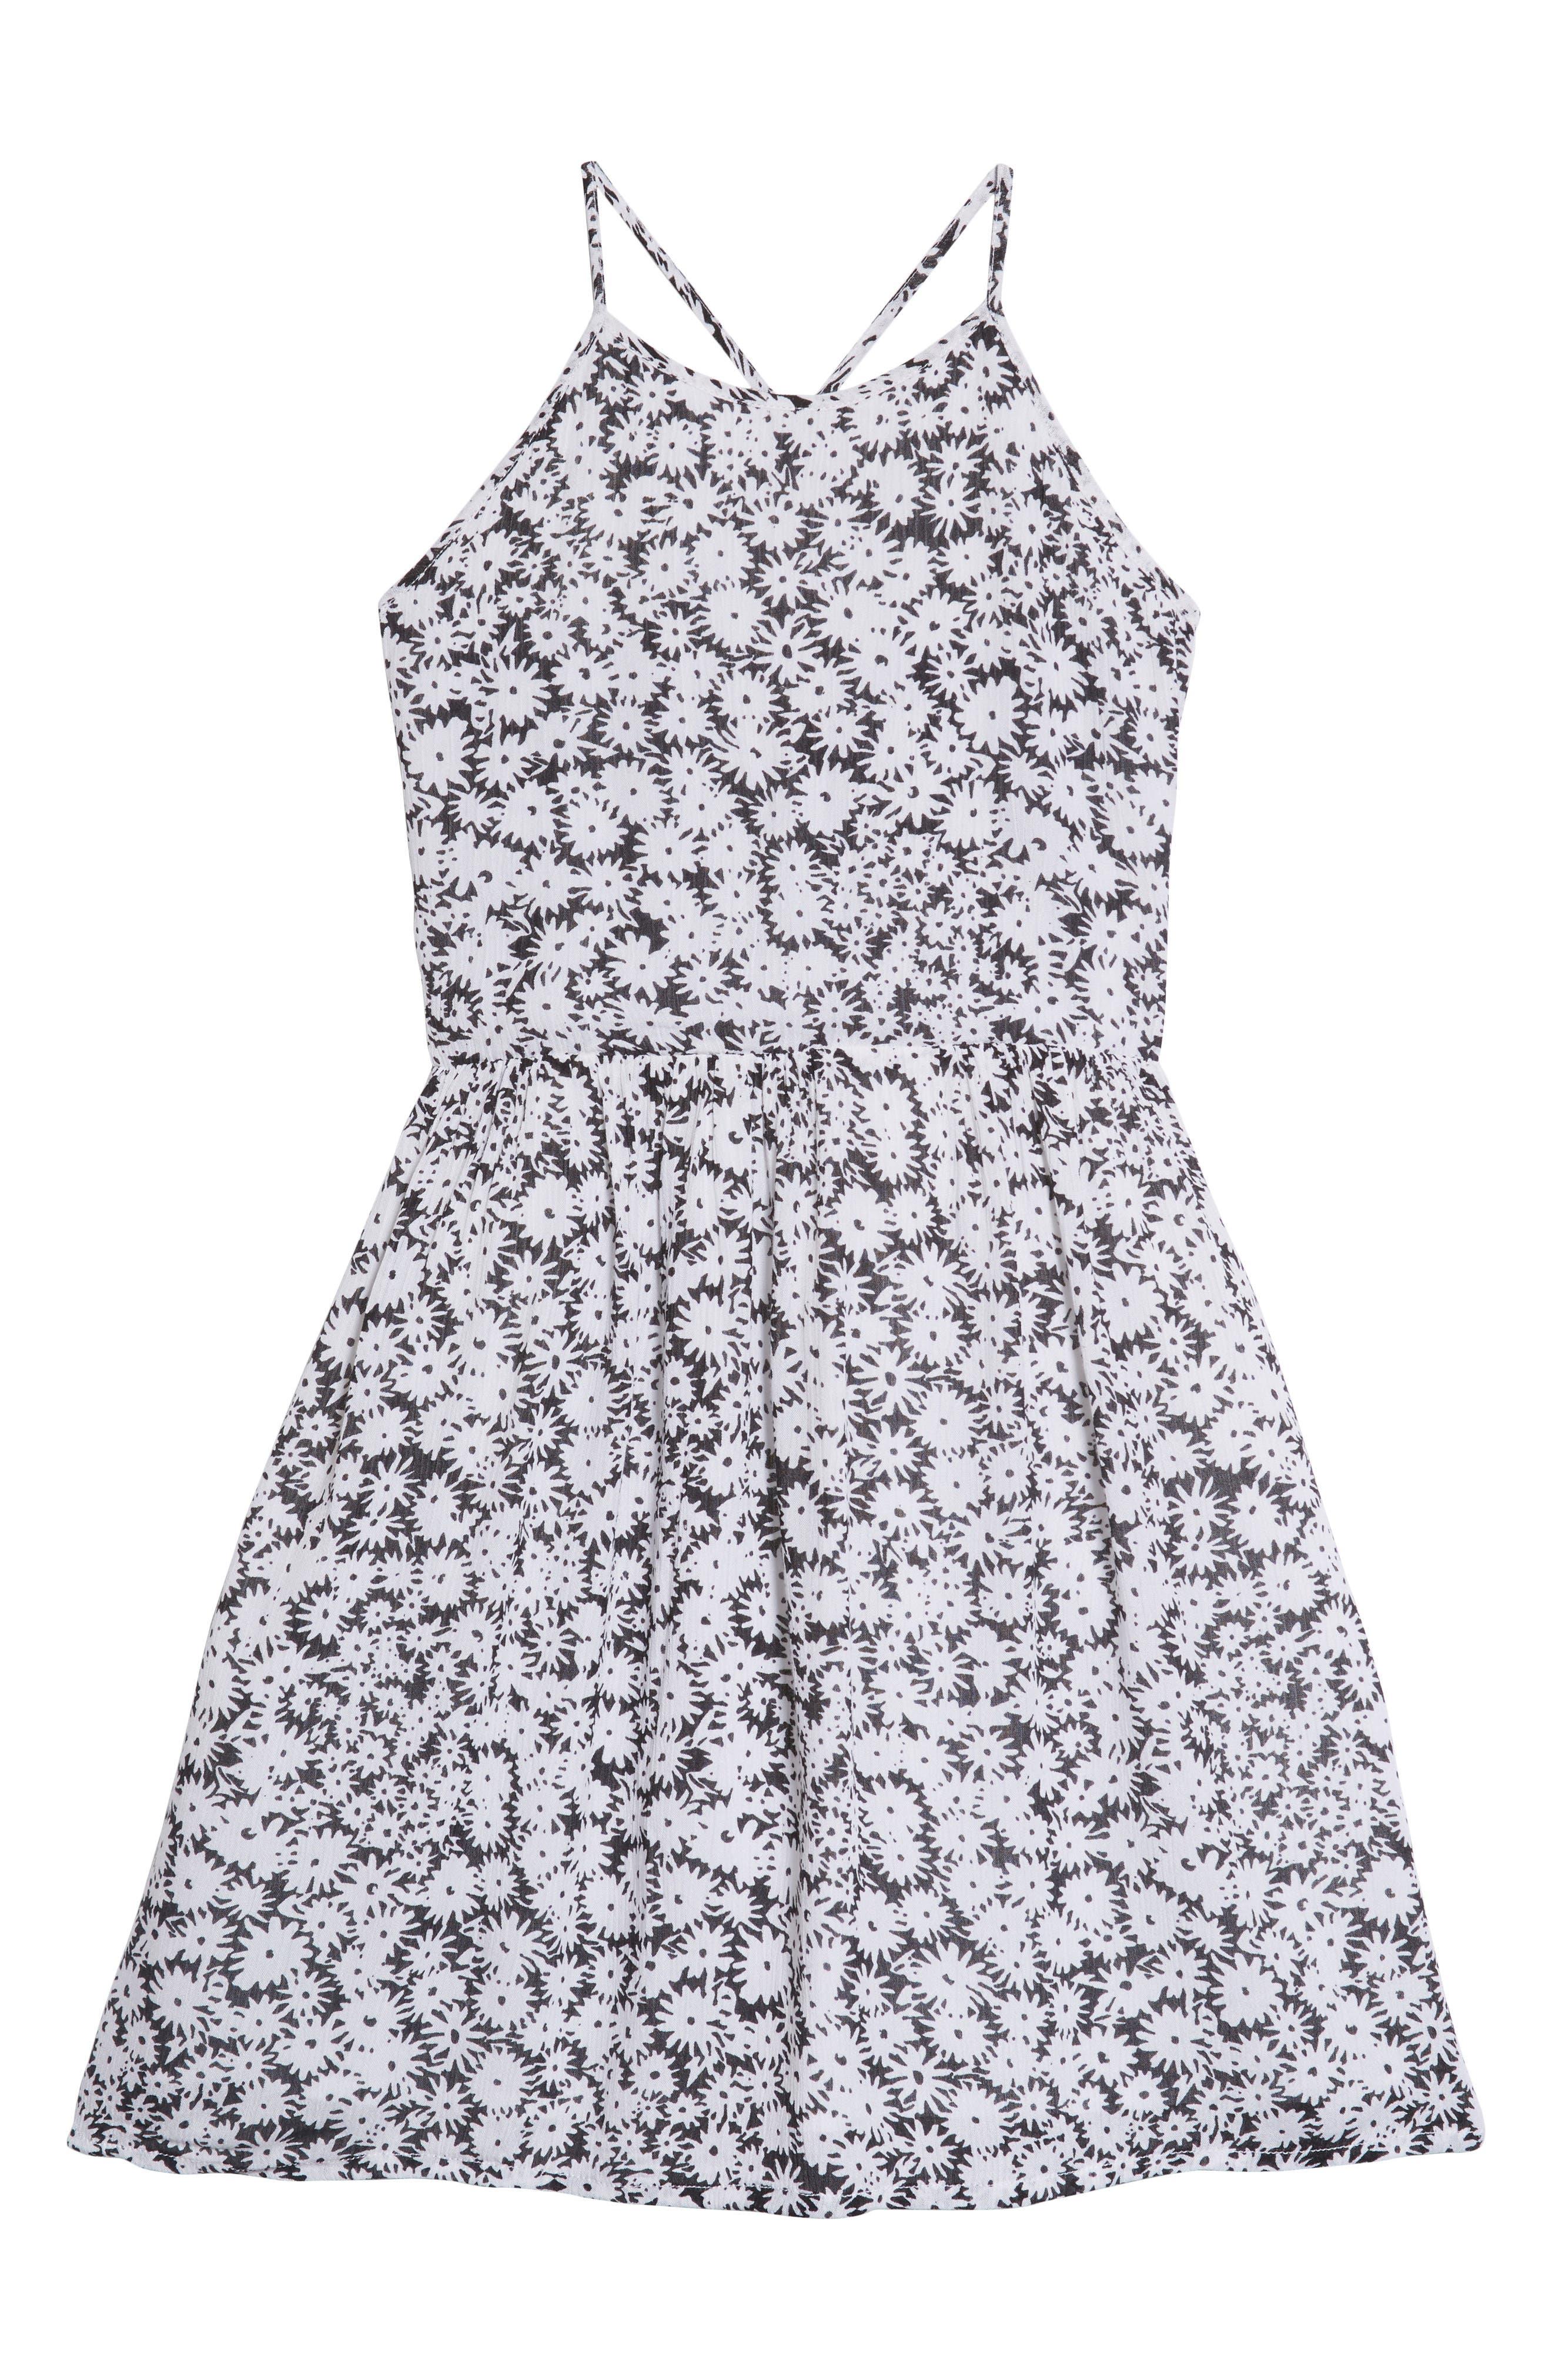 TUCKER + TATE Smocked Dress, Main, color, 001